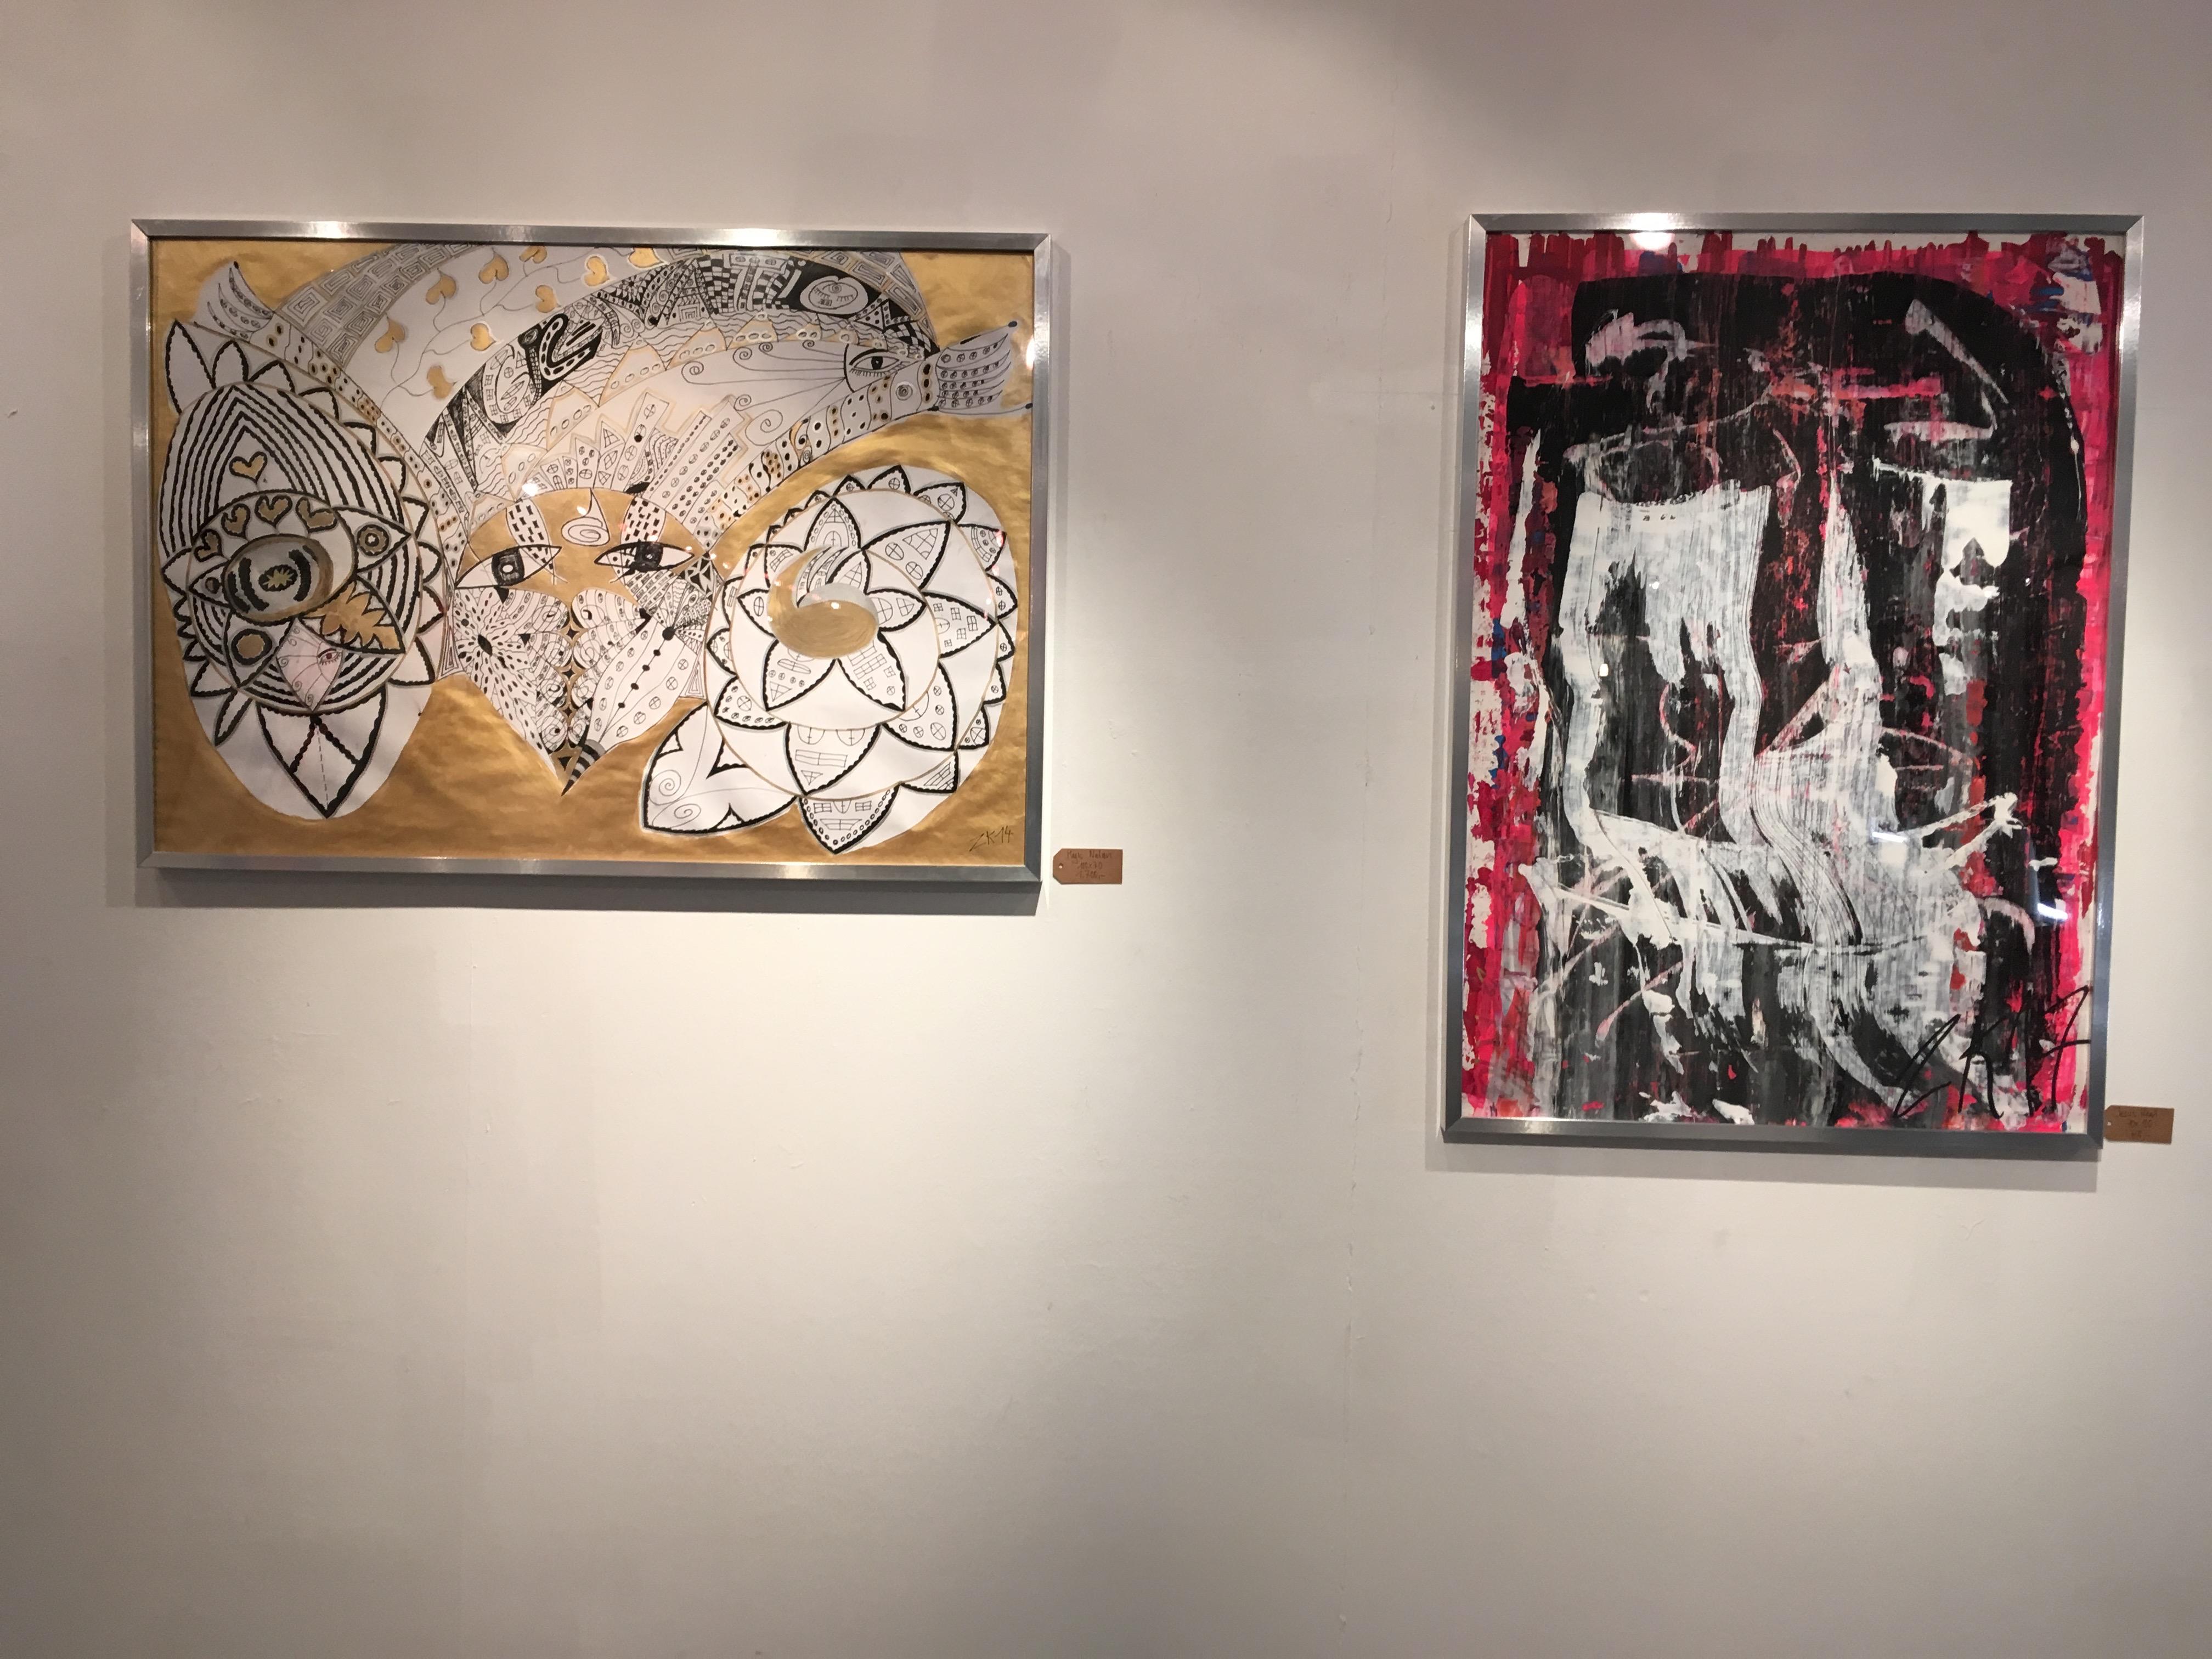 Feierwerk_Blog_Farbenladen_Ausstellung_Heads_13